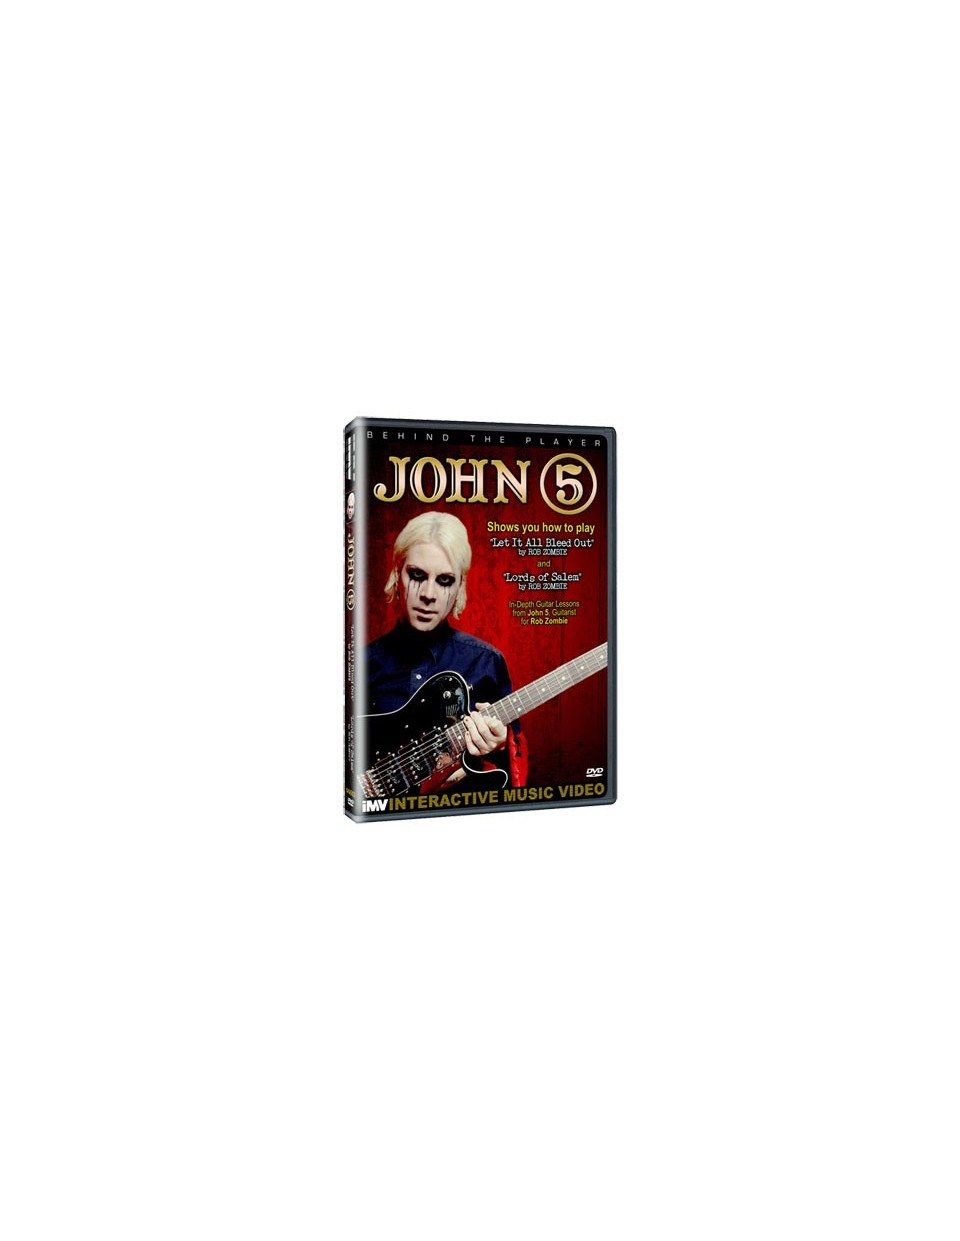 Behind the player DVD: John 5